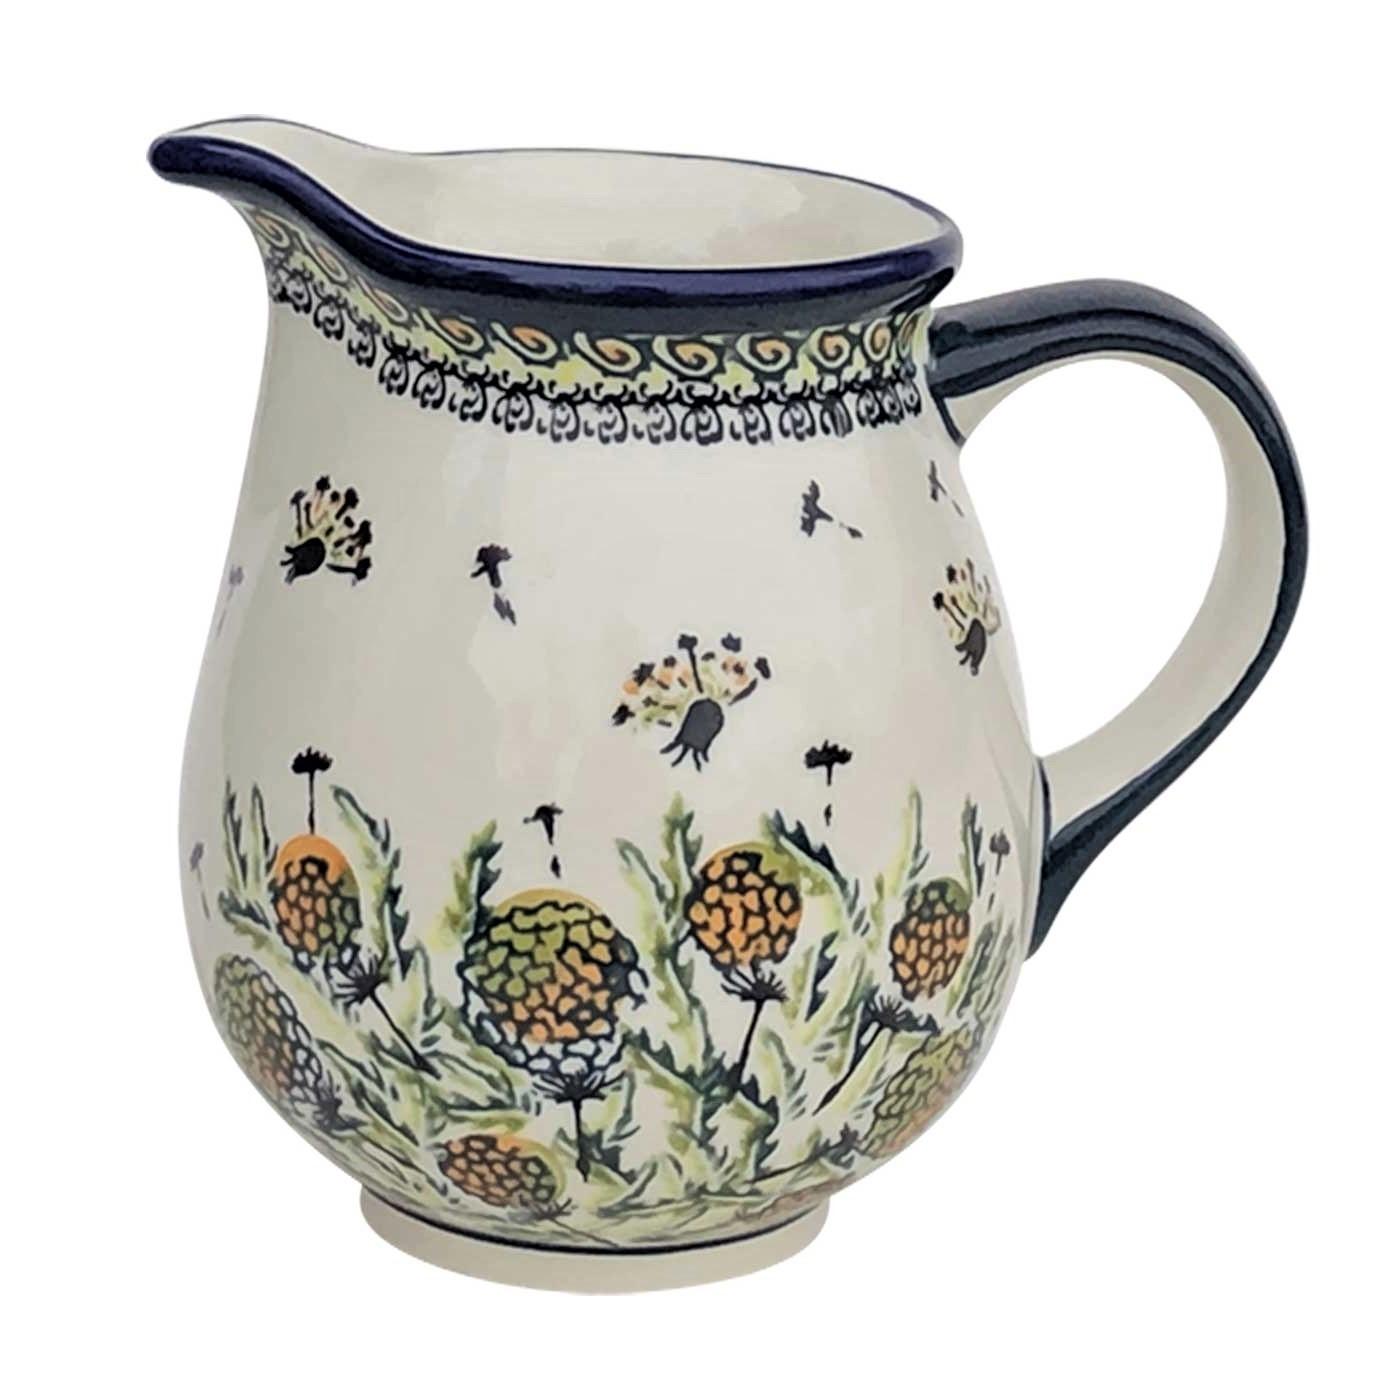 Pottery Avenue 28oz Medium Stoneware Pitcher - 951-DU183 Wishful